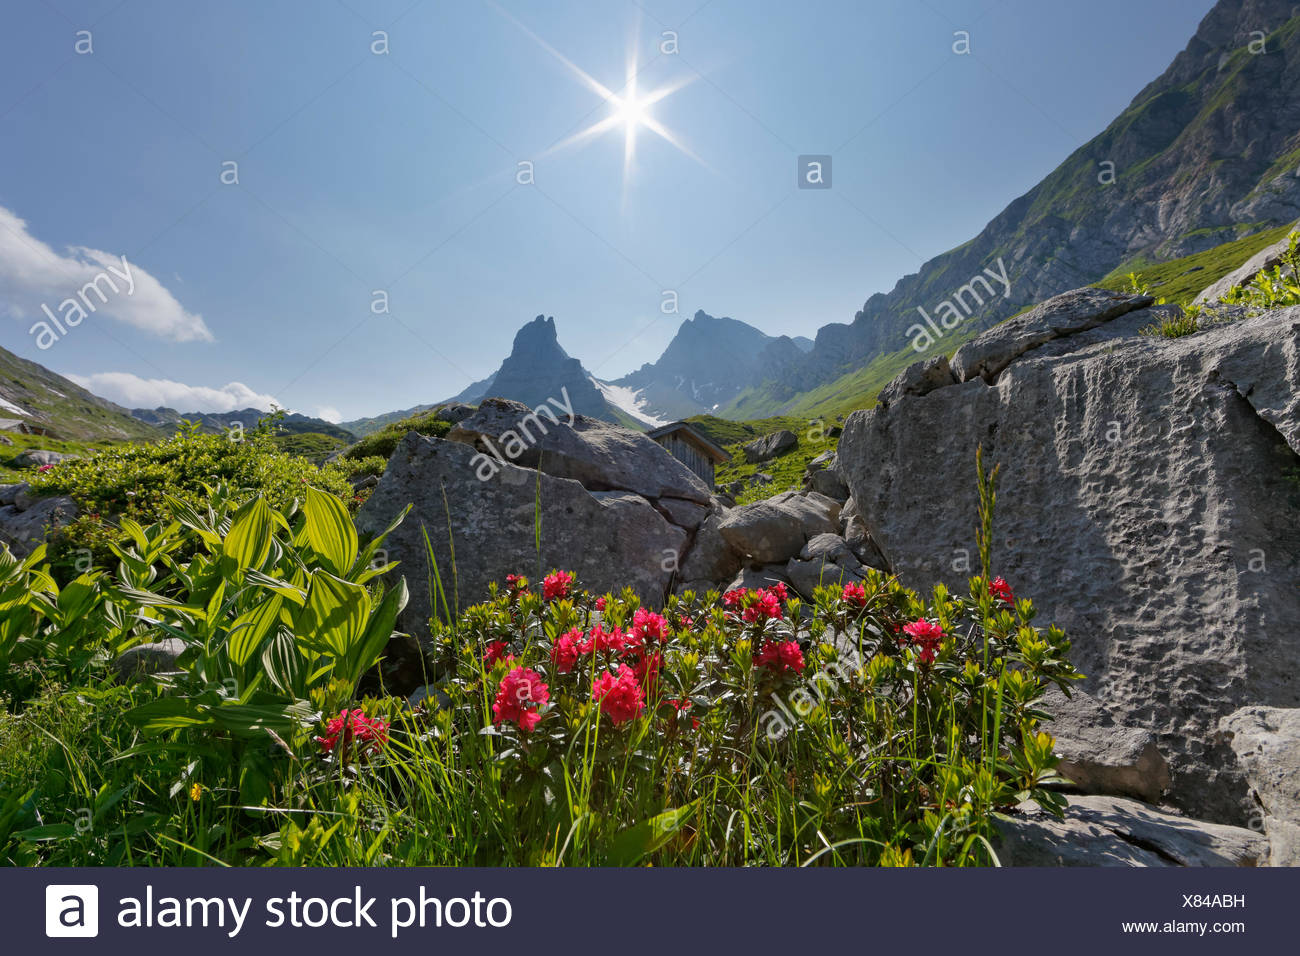 Hairy Alpenrose (Rhododendron hirsutum), Upper Laguz Alps, Rote Wand Mountain, Großes Walsertal Biosphere Park, Vorarlberg - Stock Image